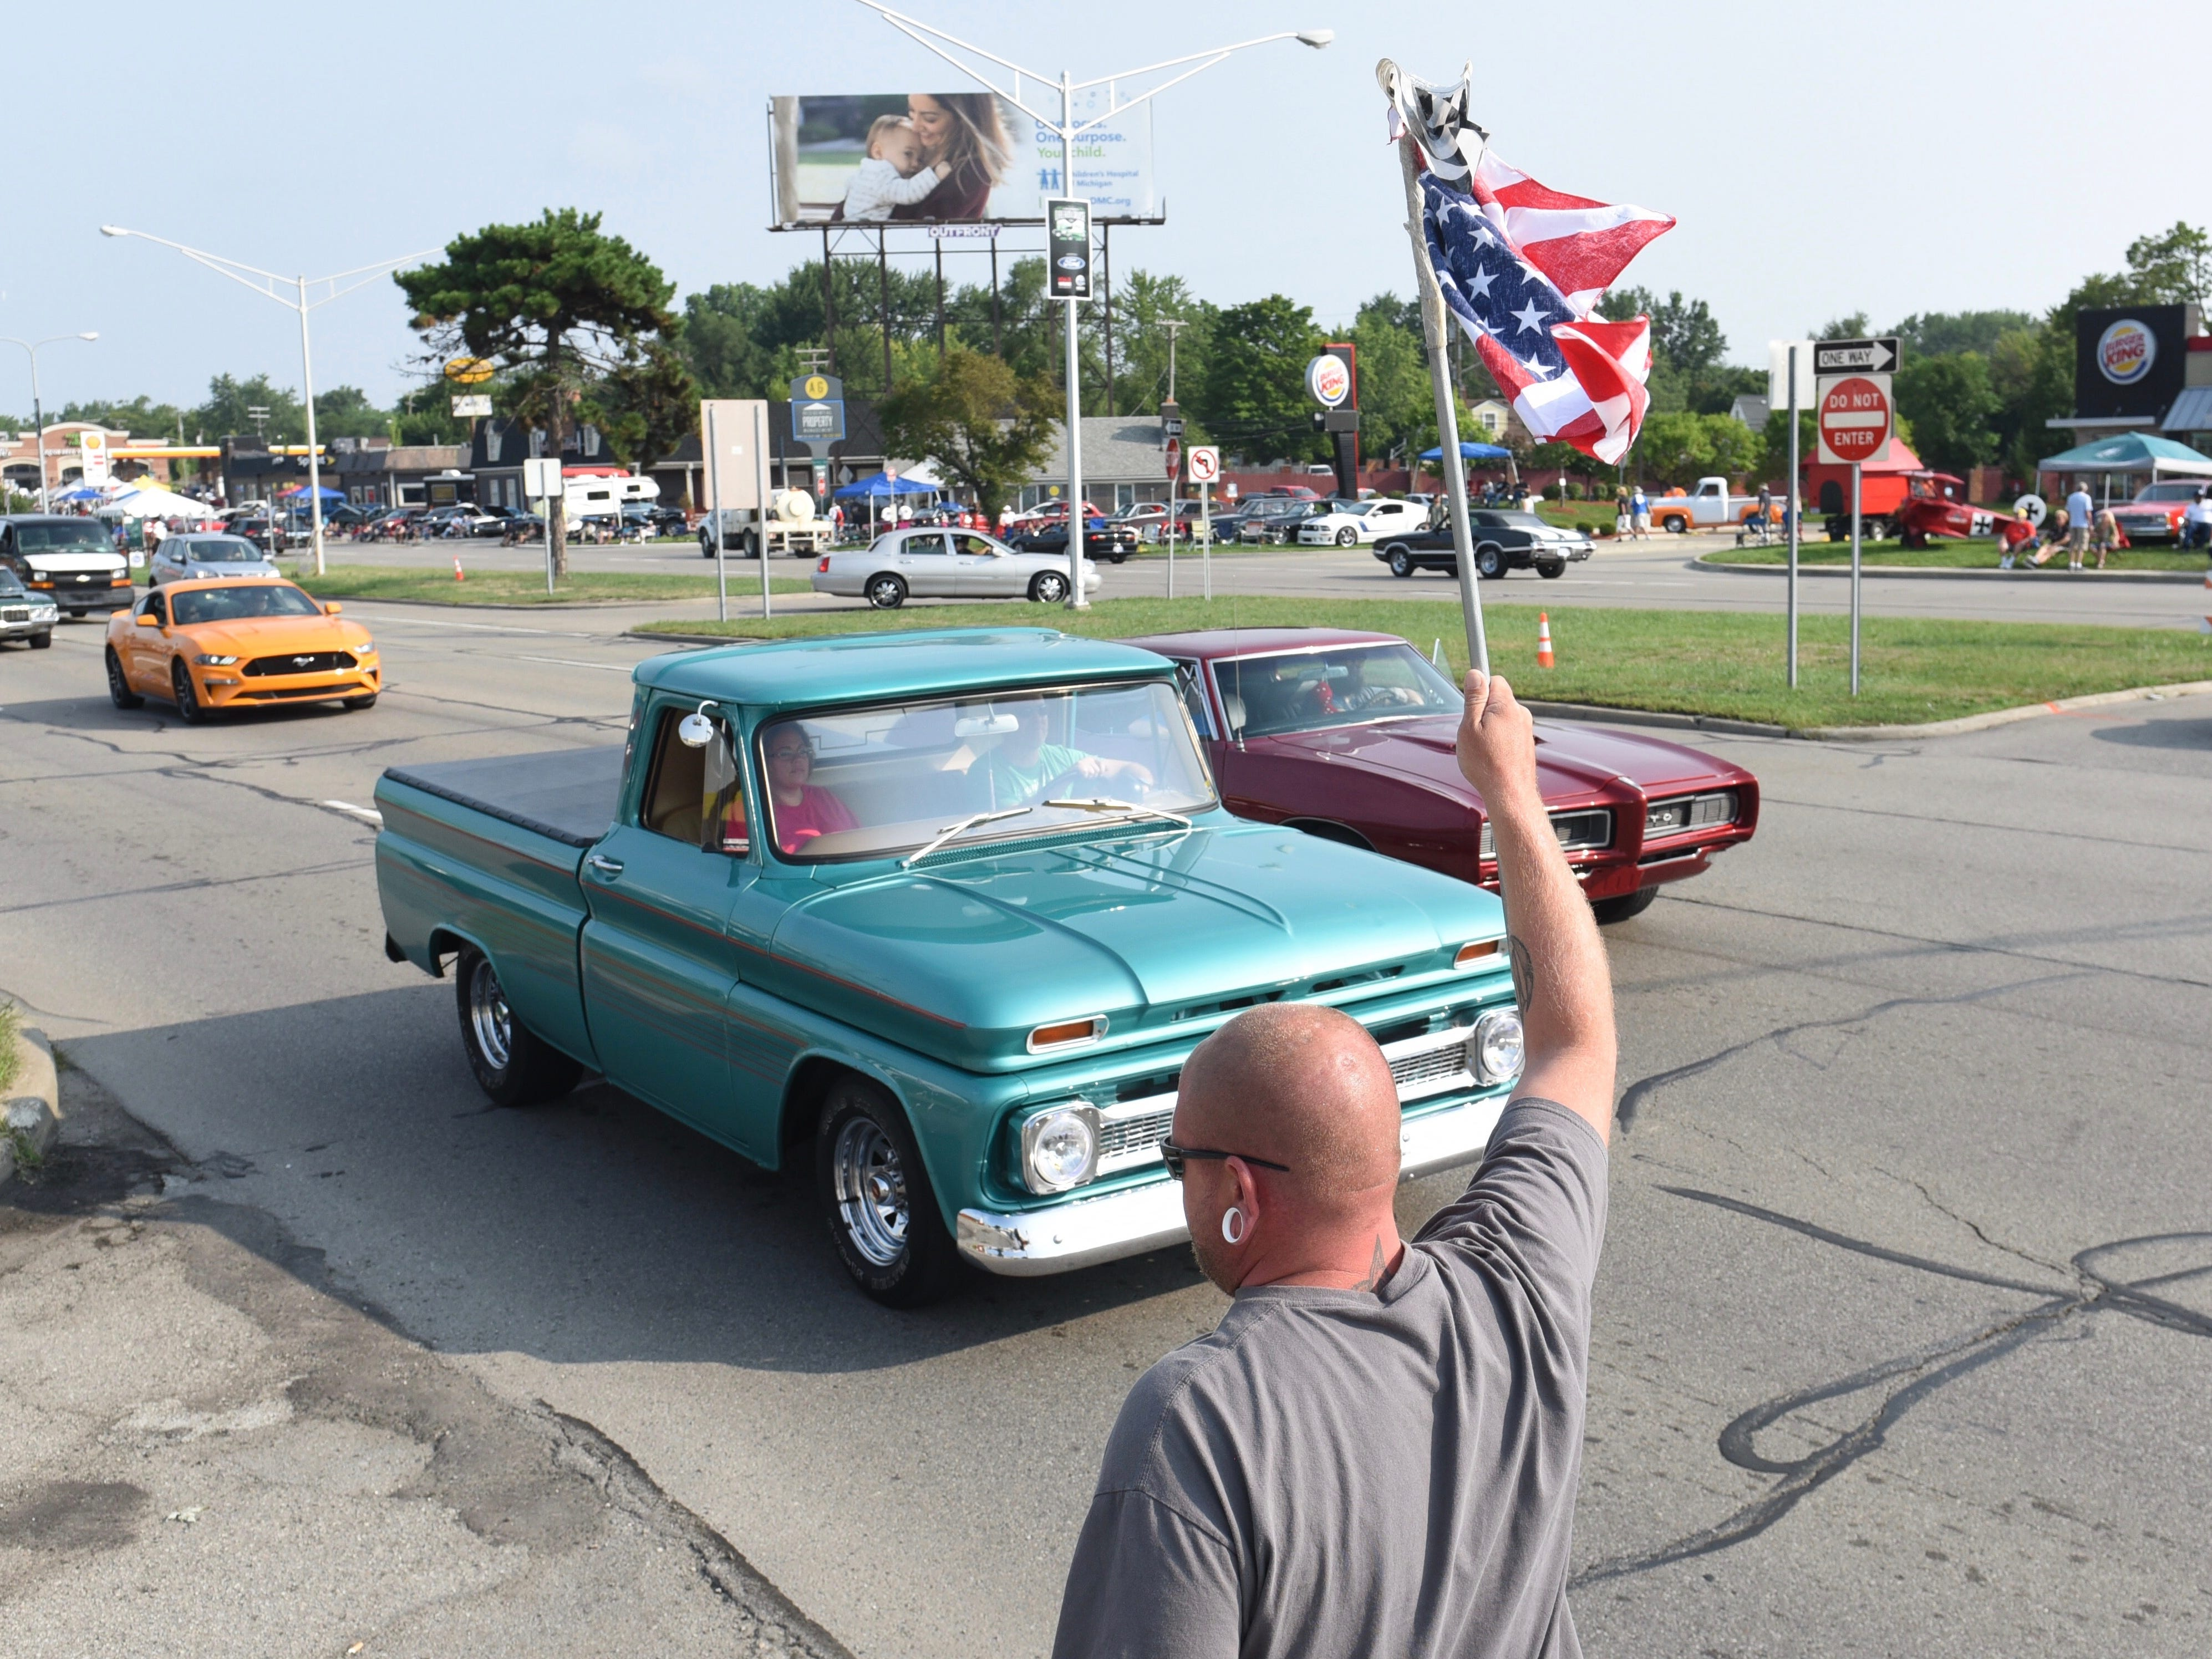 Josh Cavdill, of Dayton, Ohio, waves the American flag along Woodward Avenue in Royal Oak.